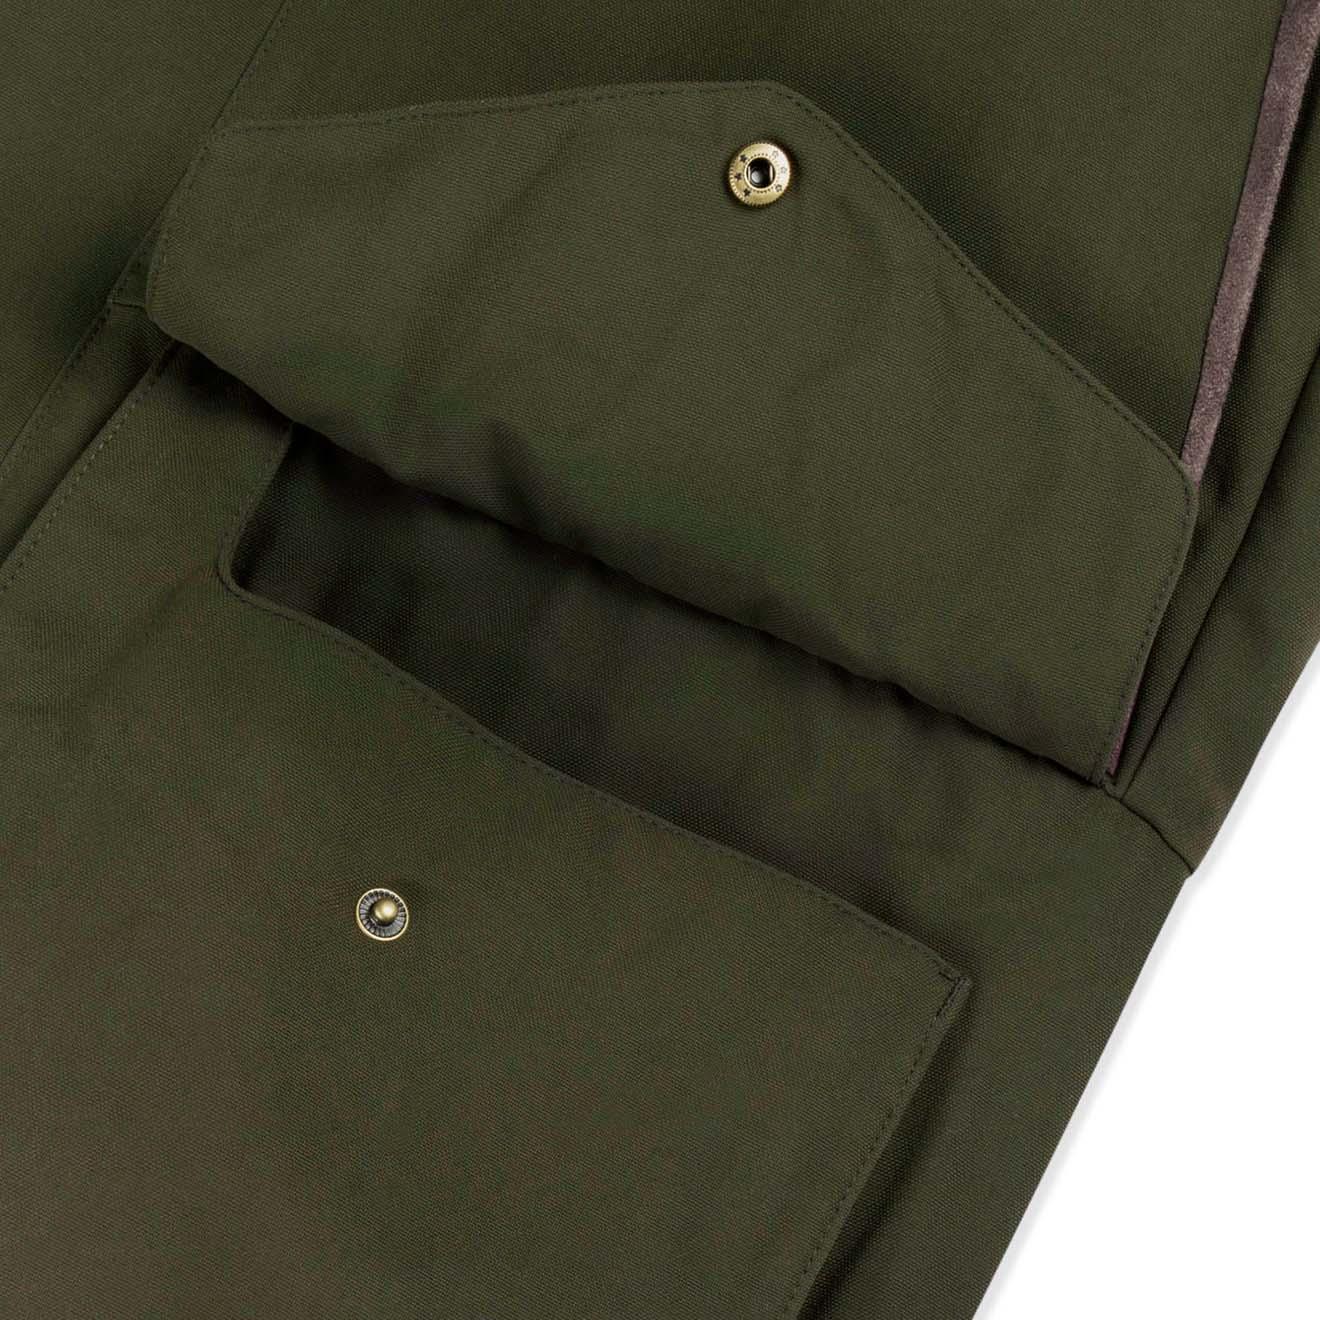 03f9256c51b88 Musto Highland GORE-TEX Lite Jacket Dark Moss - The Sporting Lodge